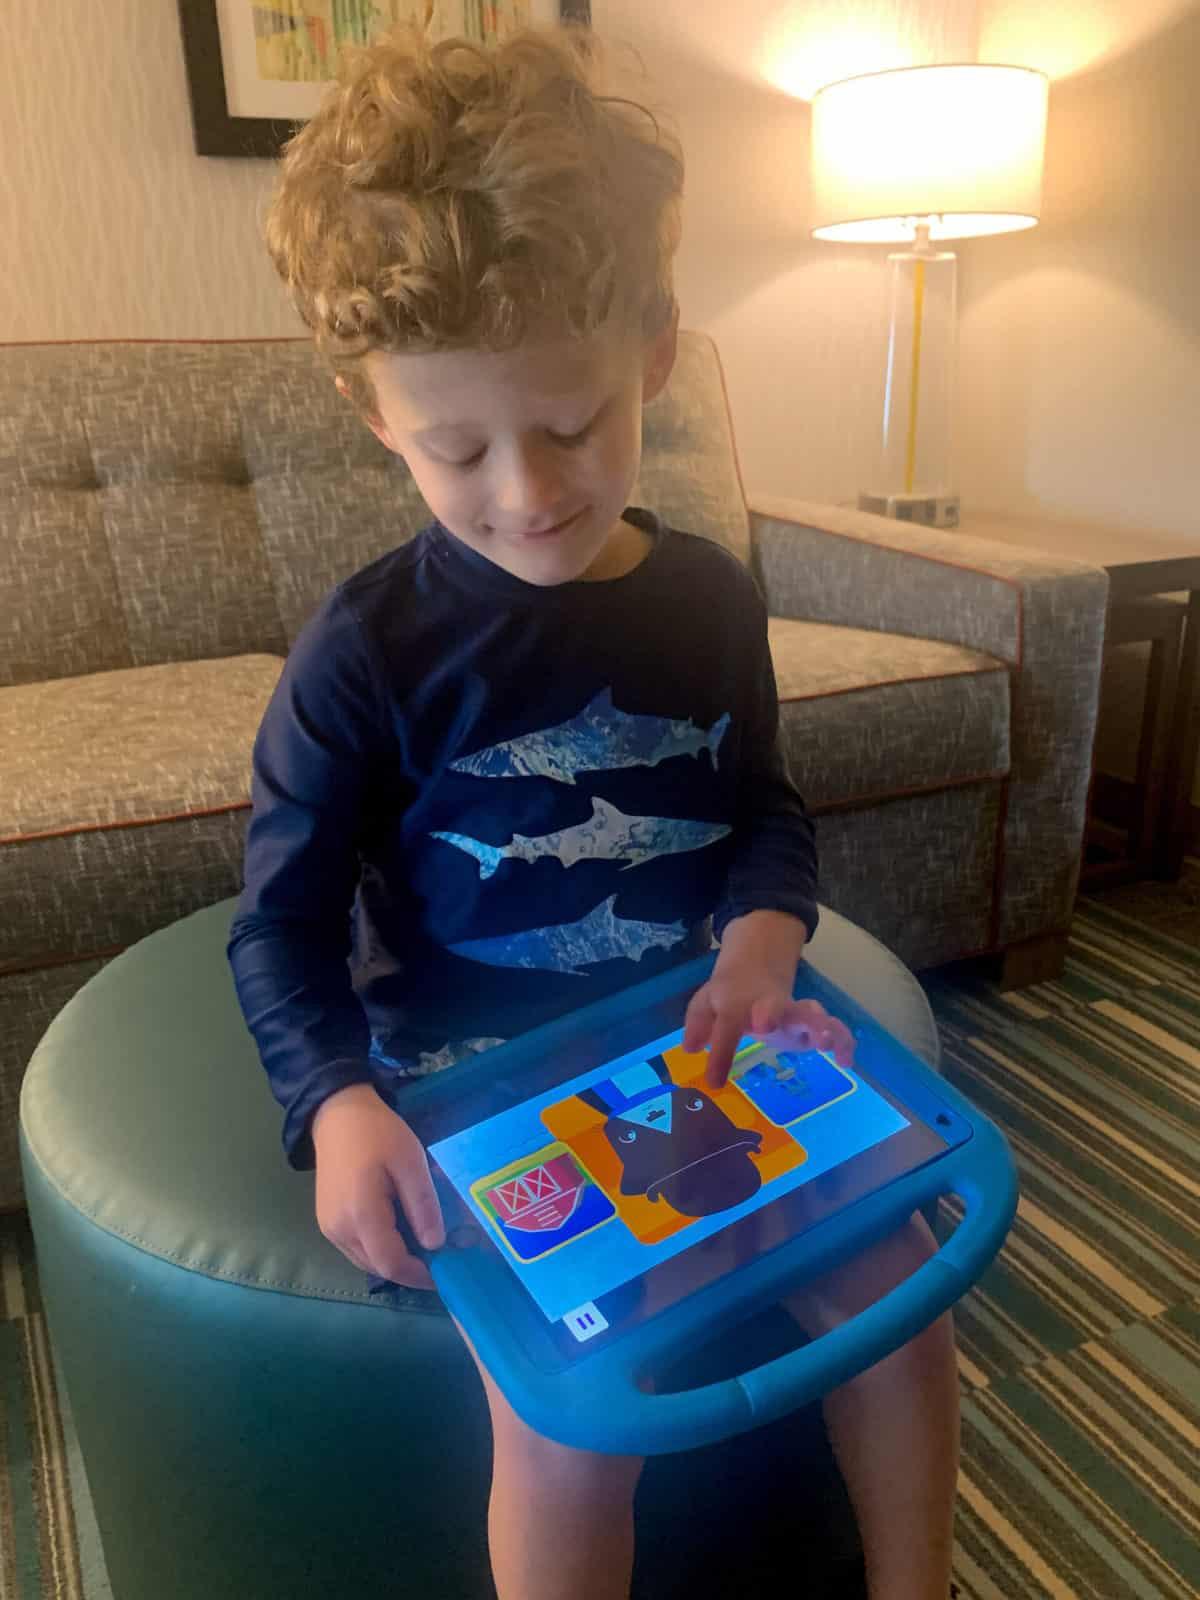 4-year-old boy interacting with Noggin app on ipad in hotel room